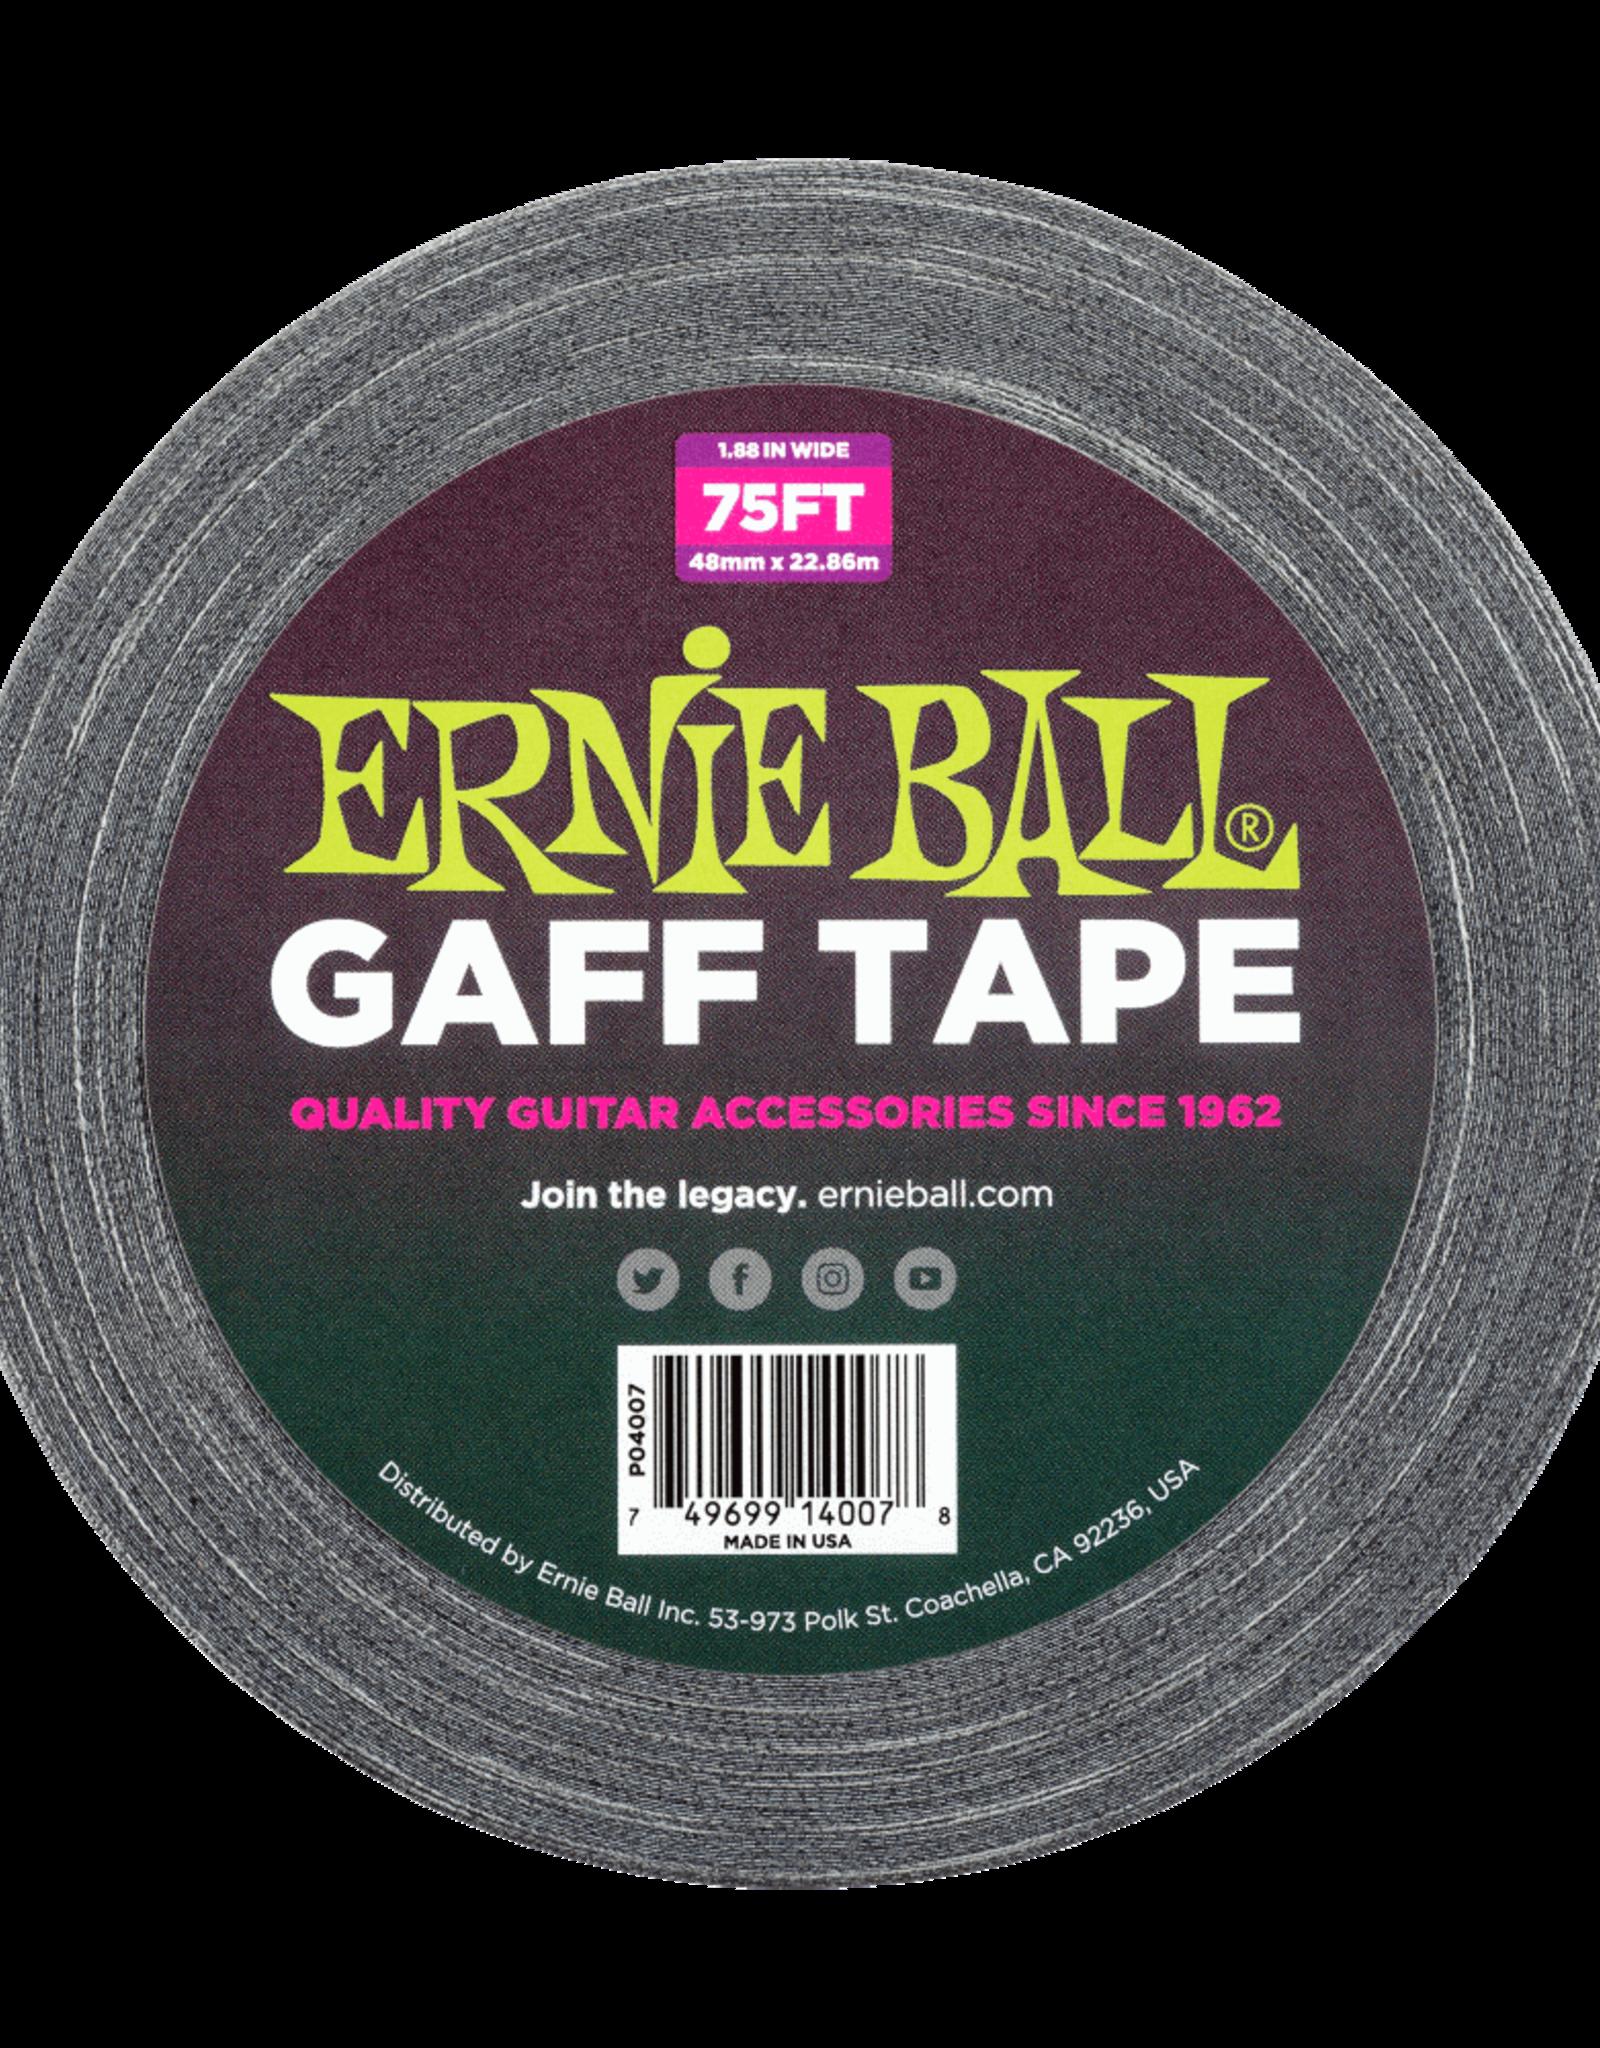 "Ernie Ball Ernie Ball Pro 2"" Gaff' Tape 75Ft Roll"